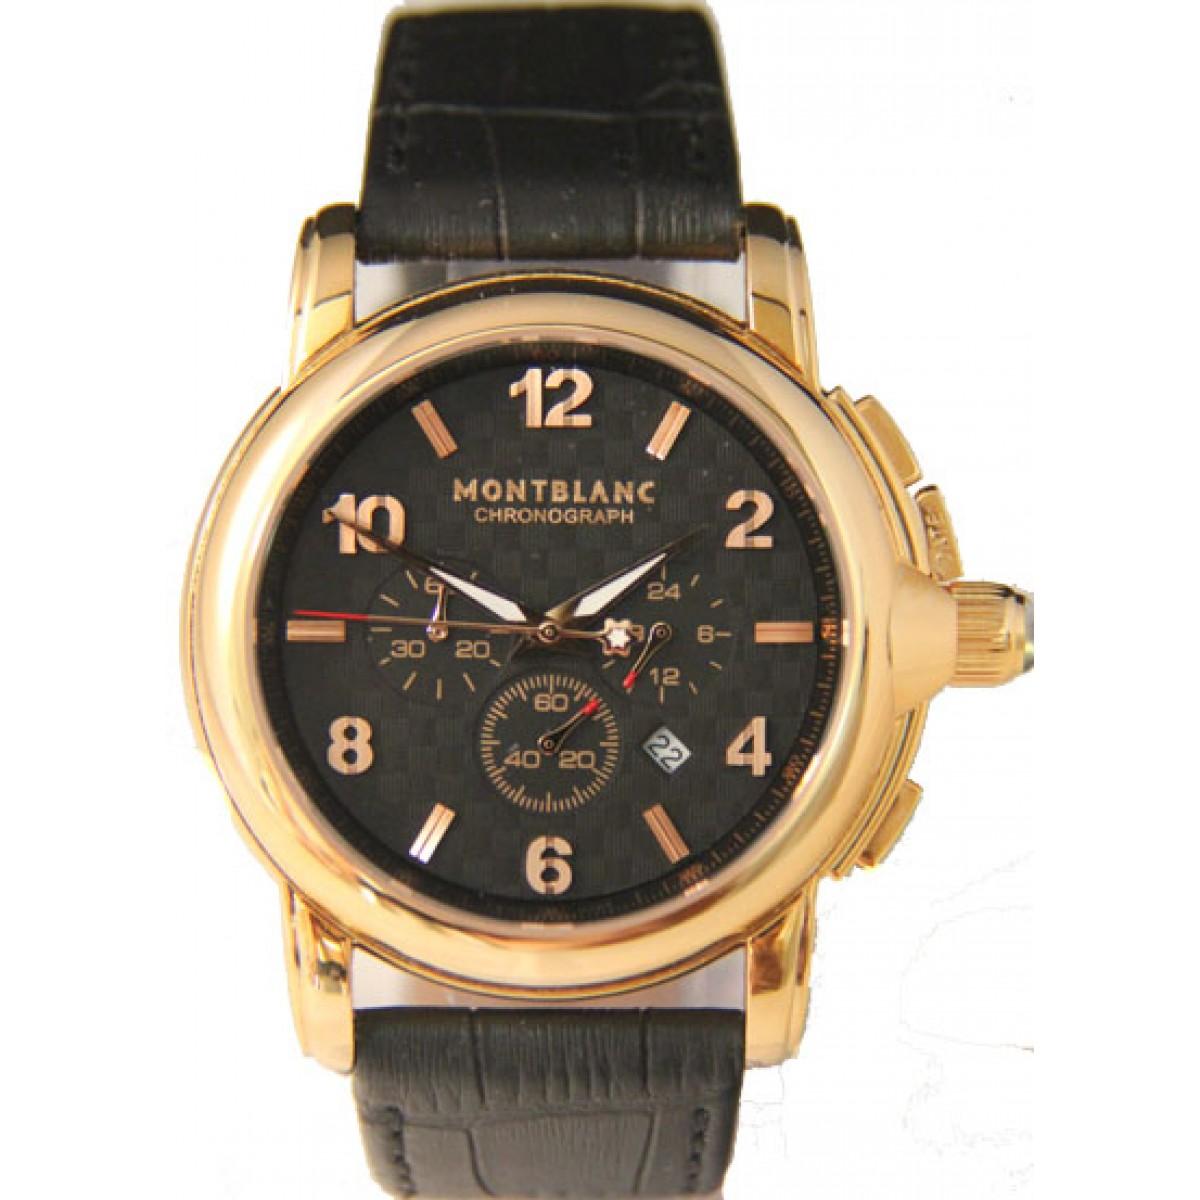 9e38ad641b6 Relógio Réplica Montblanc Chronograph Gold Black